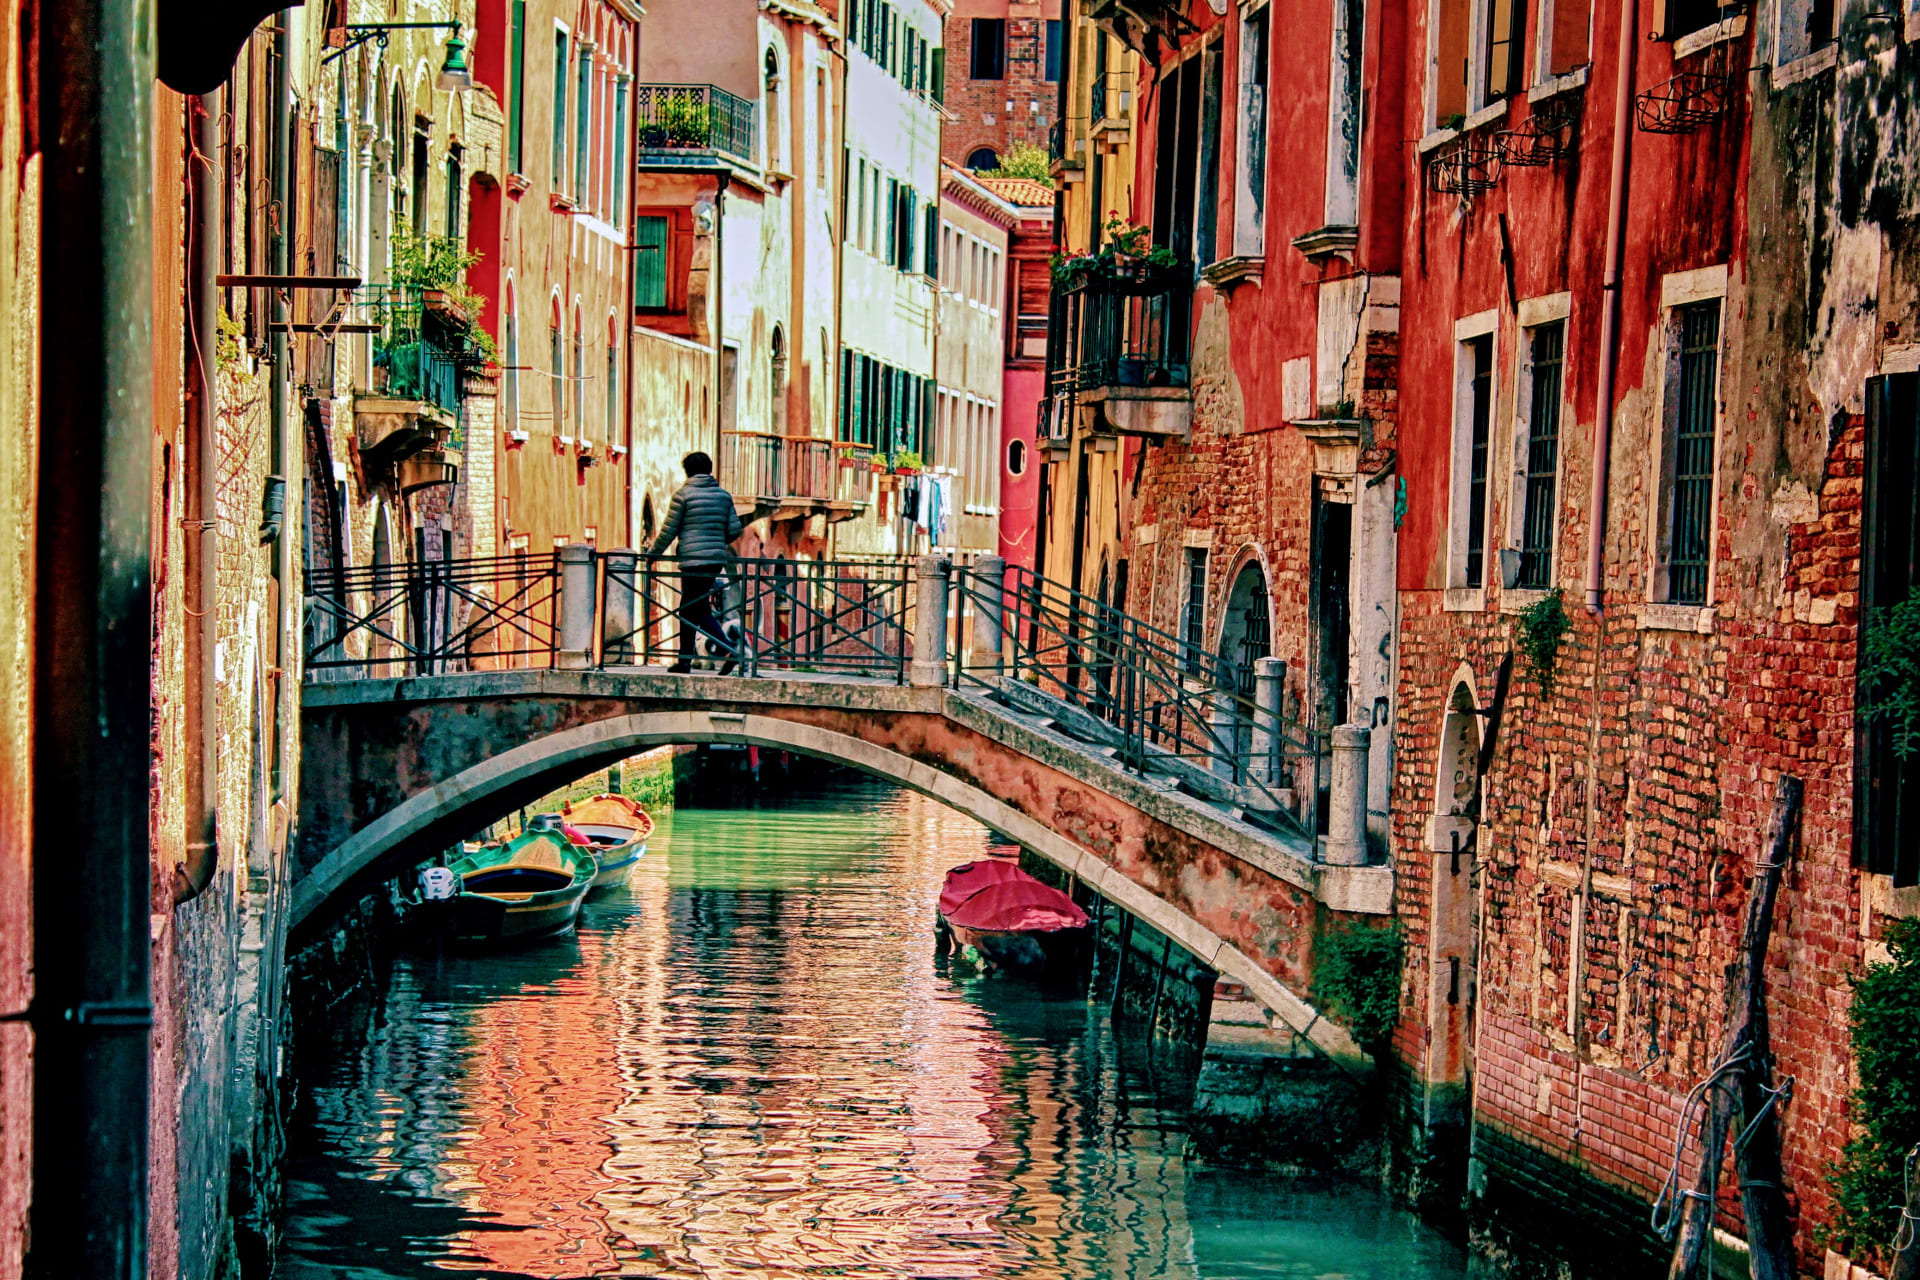 Venice - The Beauty and Mystery of Venice